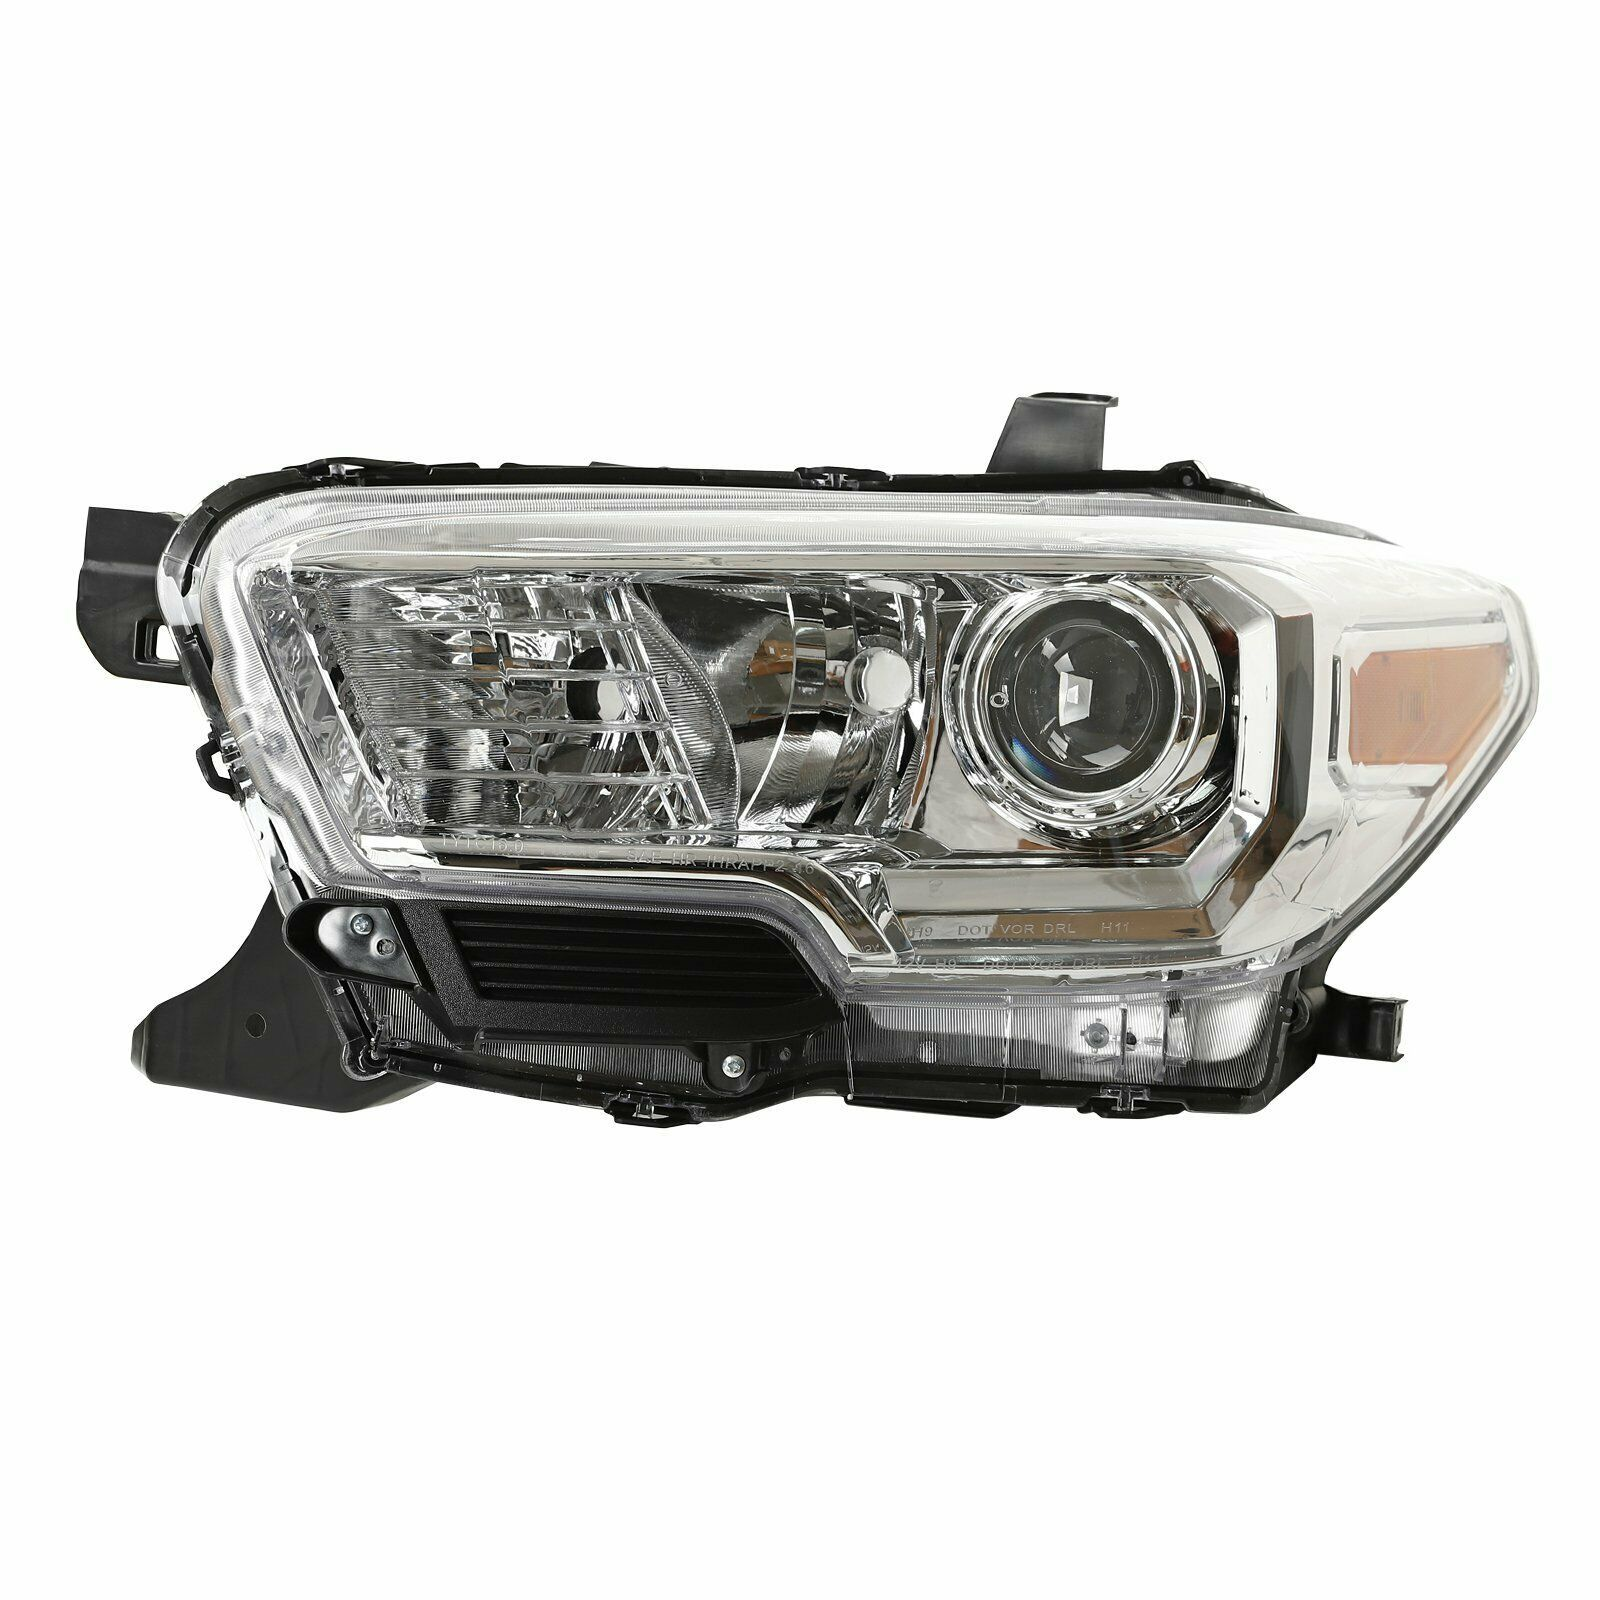 Halogen Headlight Headlamp Left Side For 2016-2020 Toyota Tacoma SR/SR5 w/o DRL - $127.11